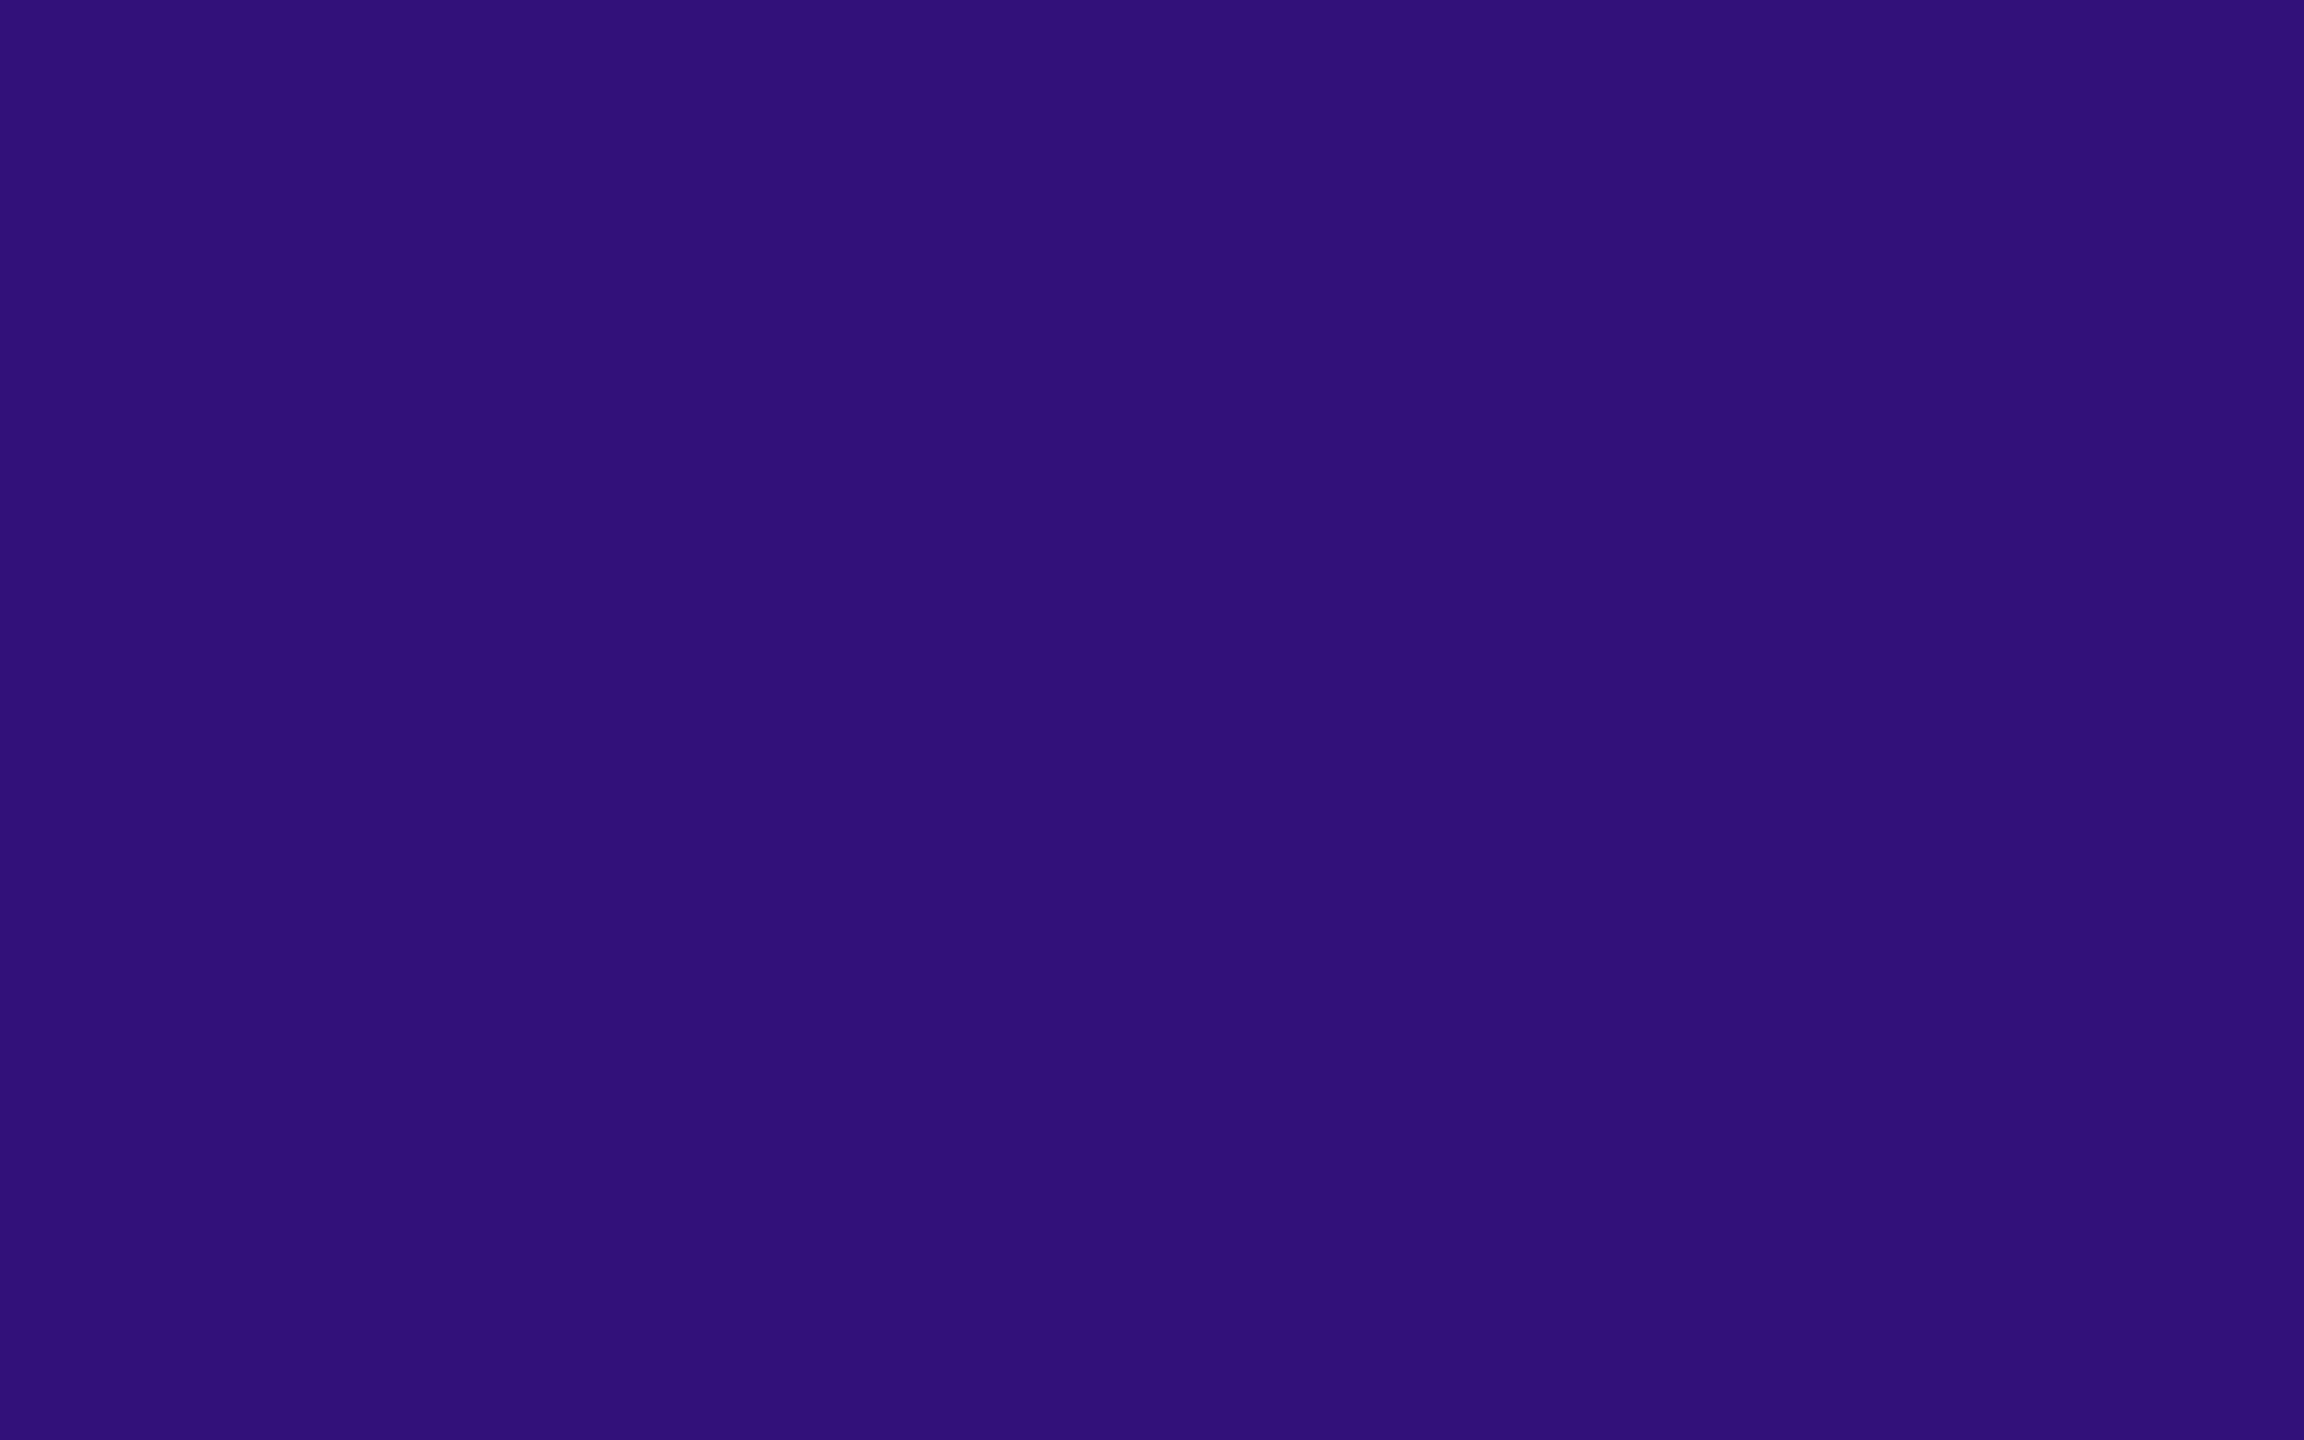 2304x1440 Persian Indigo Solid Color Background